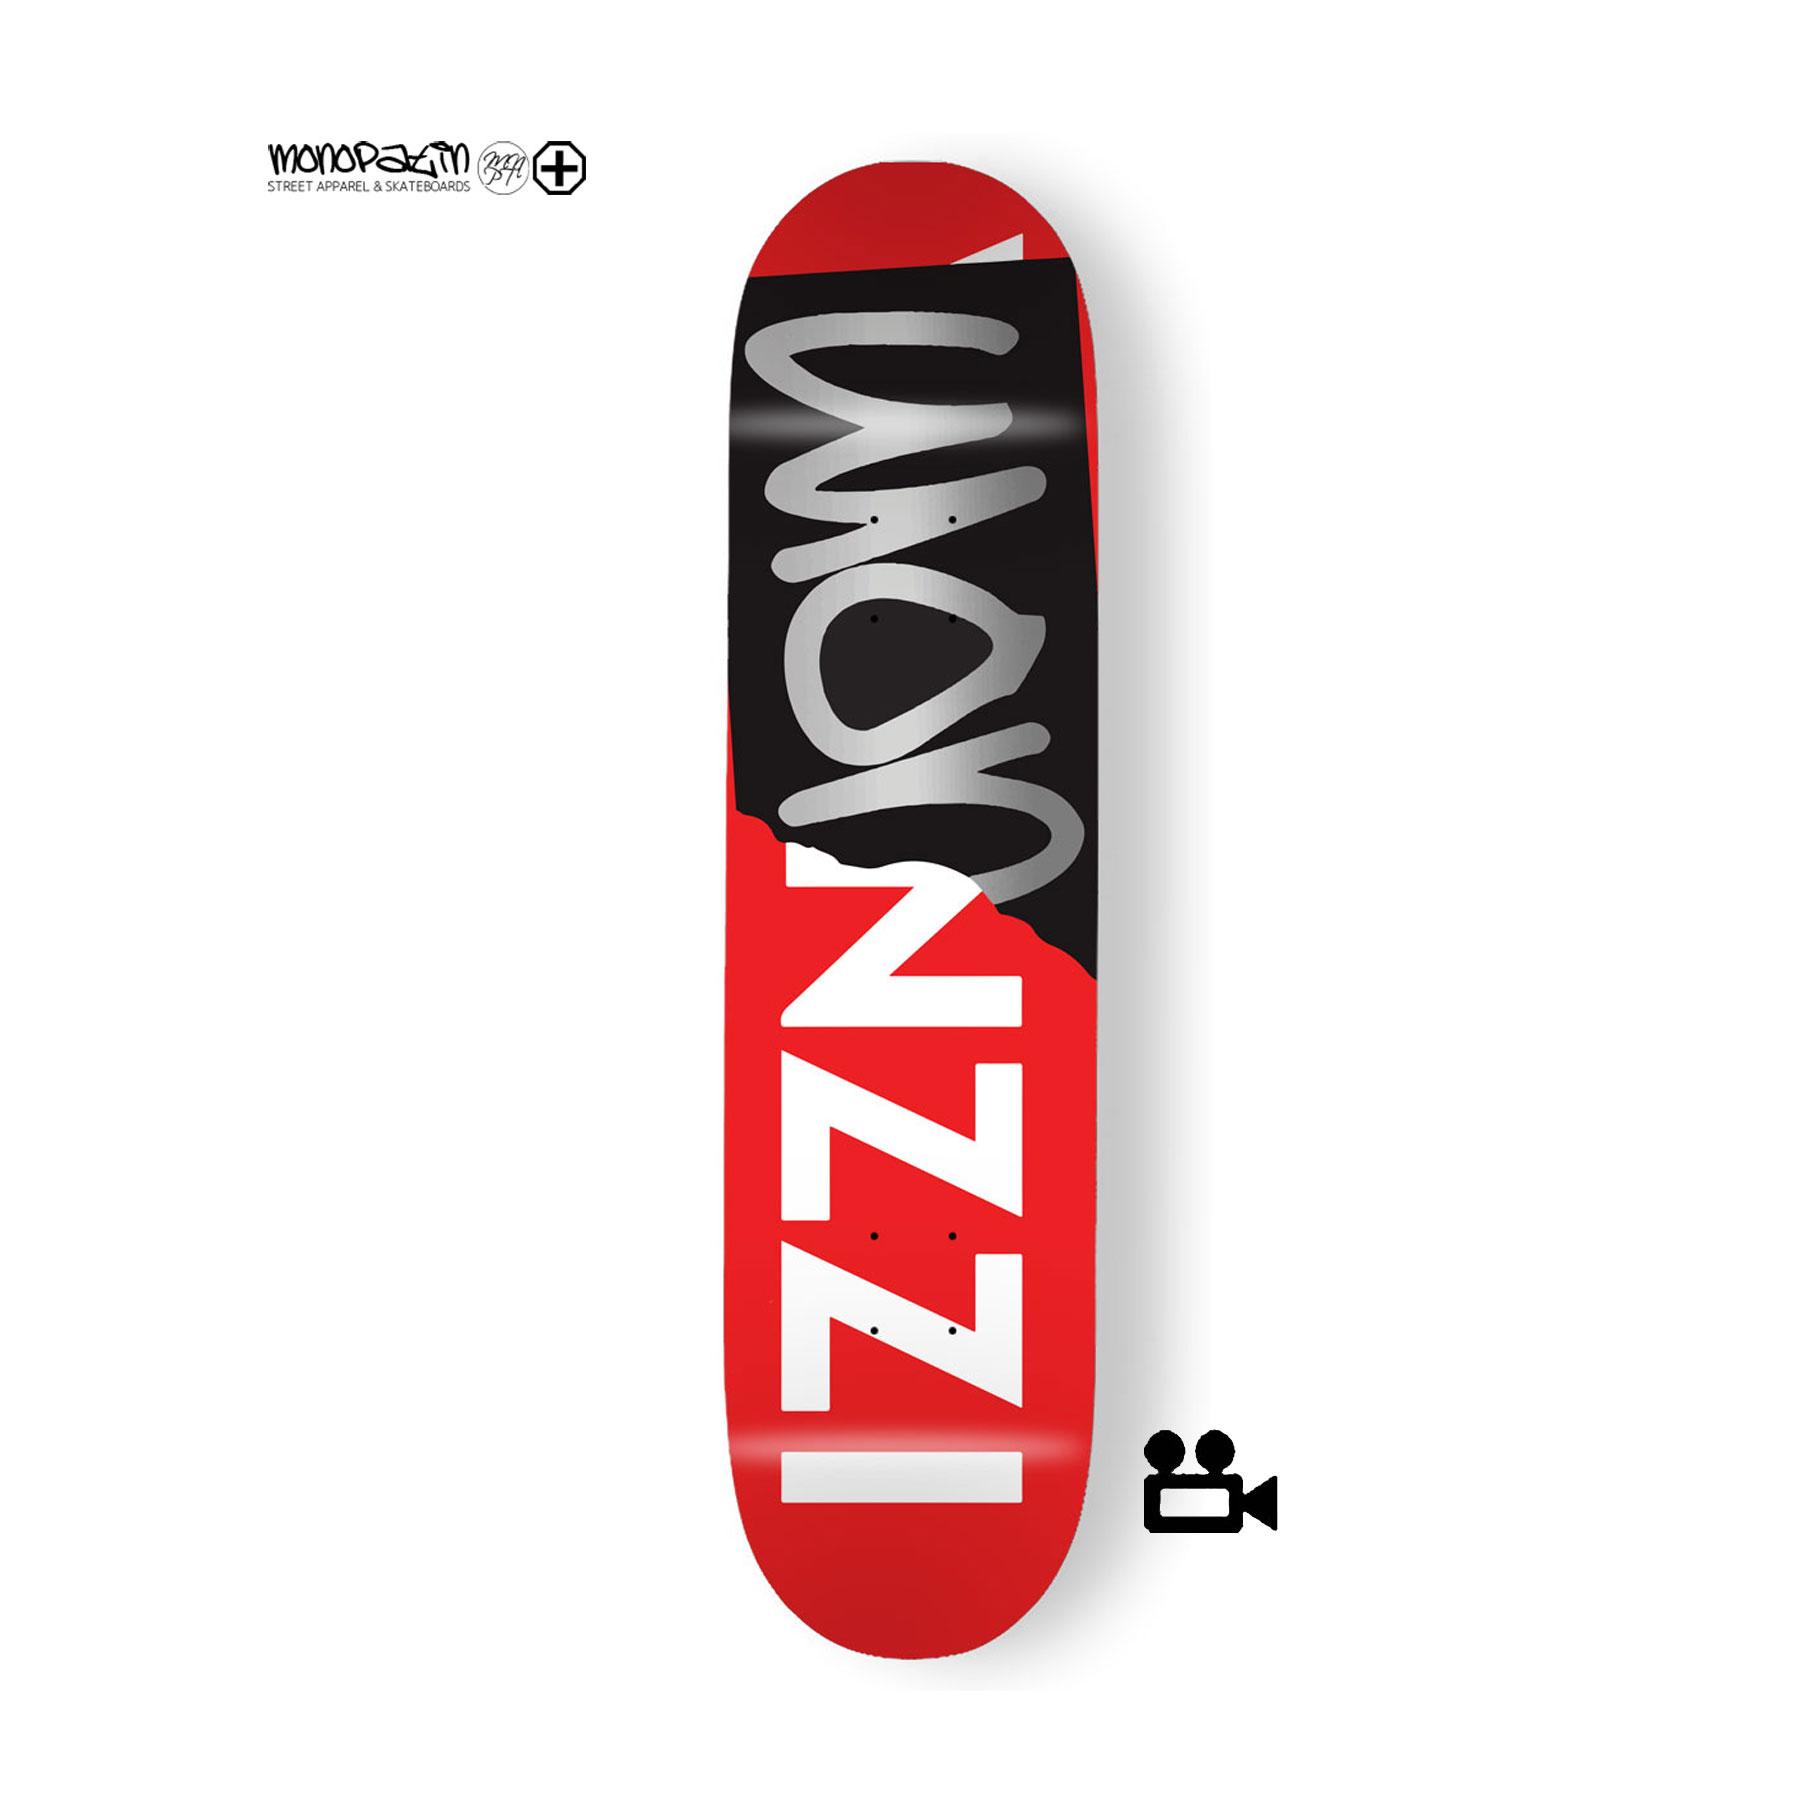 """wonzzi"" signature 스케이트보드 데크"